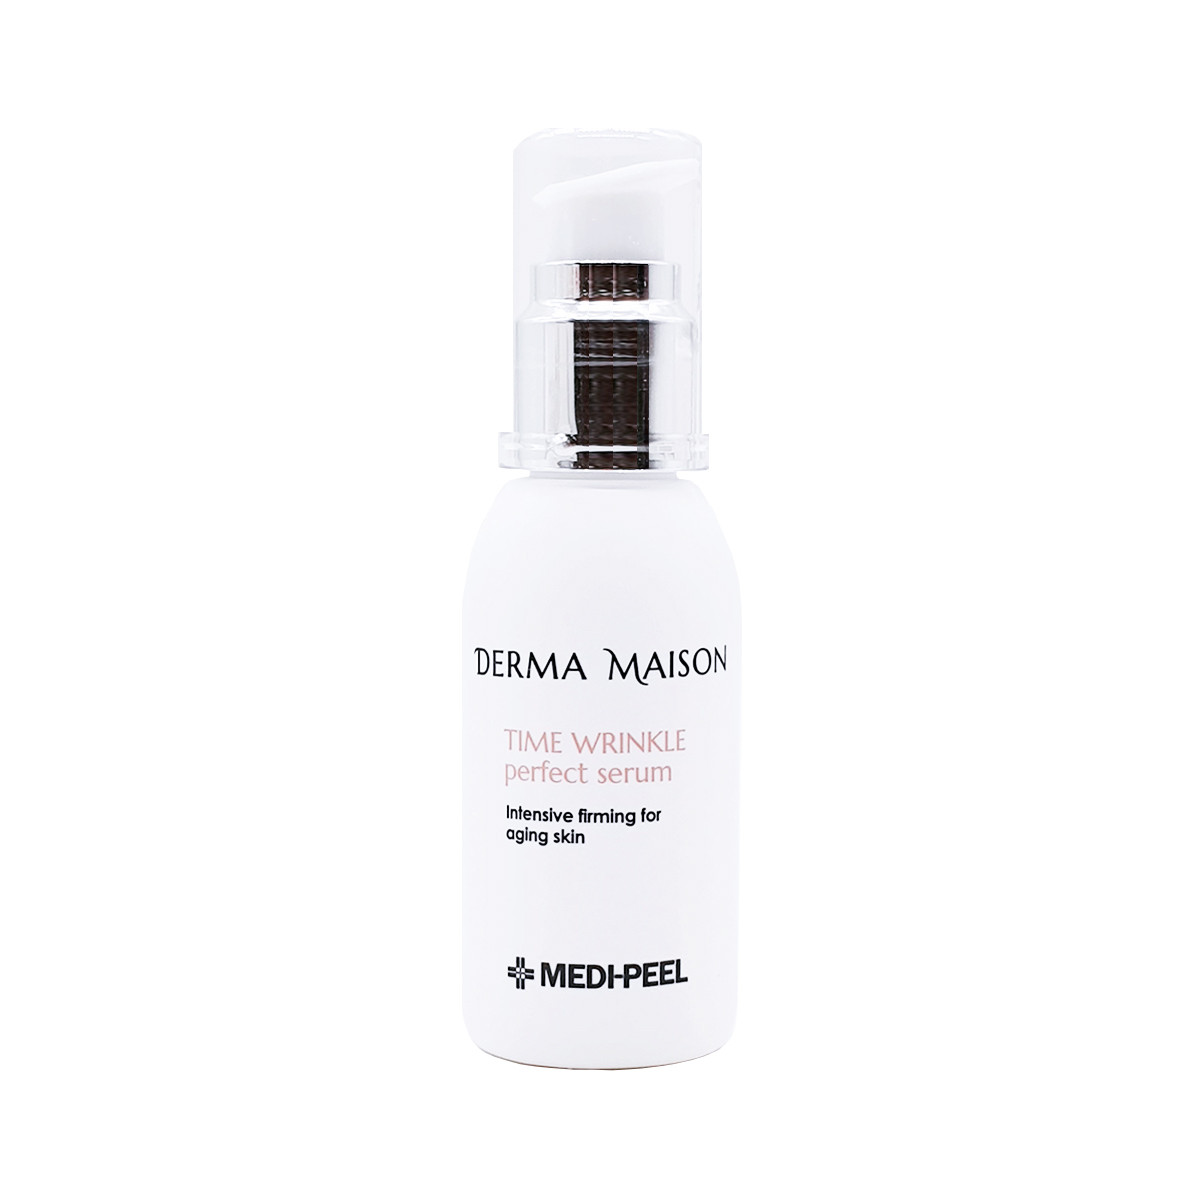 Medi-Peel Антиоксидантная сыворотка с токоферолом Derma Maison Time Wrinkle Perfect Serum / 50 мл.